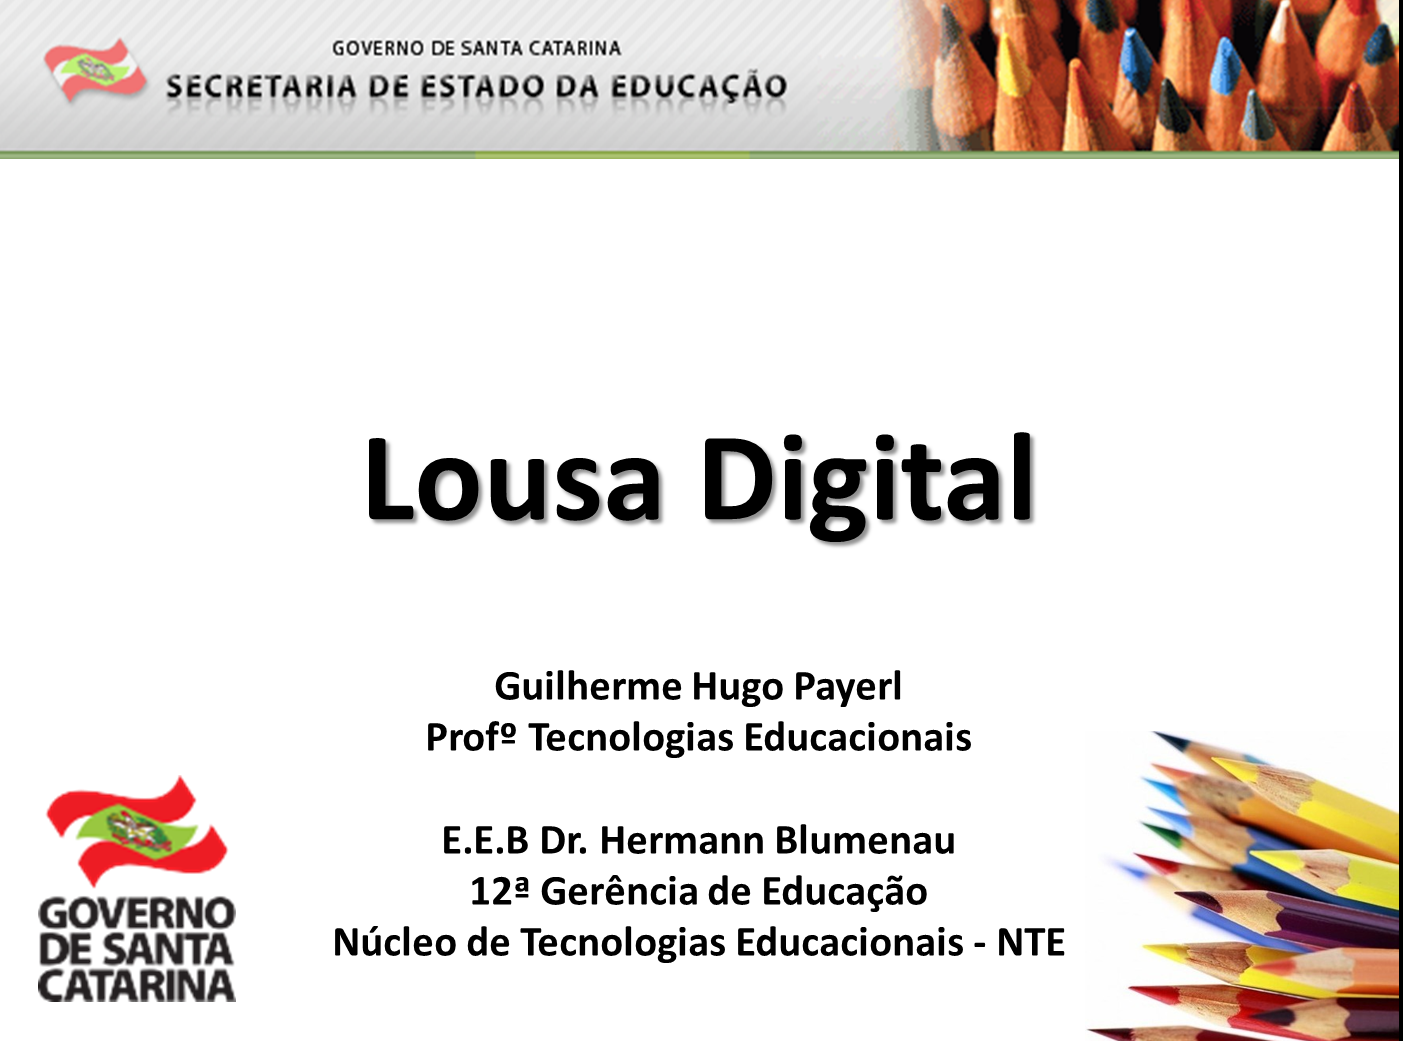 http://www.slideshare.net/TecnologiasRiodoSul/lousa-digital-37870076